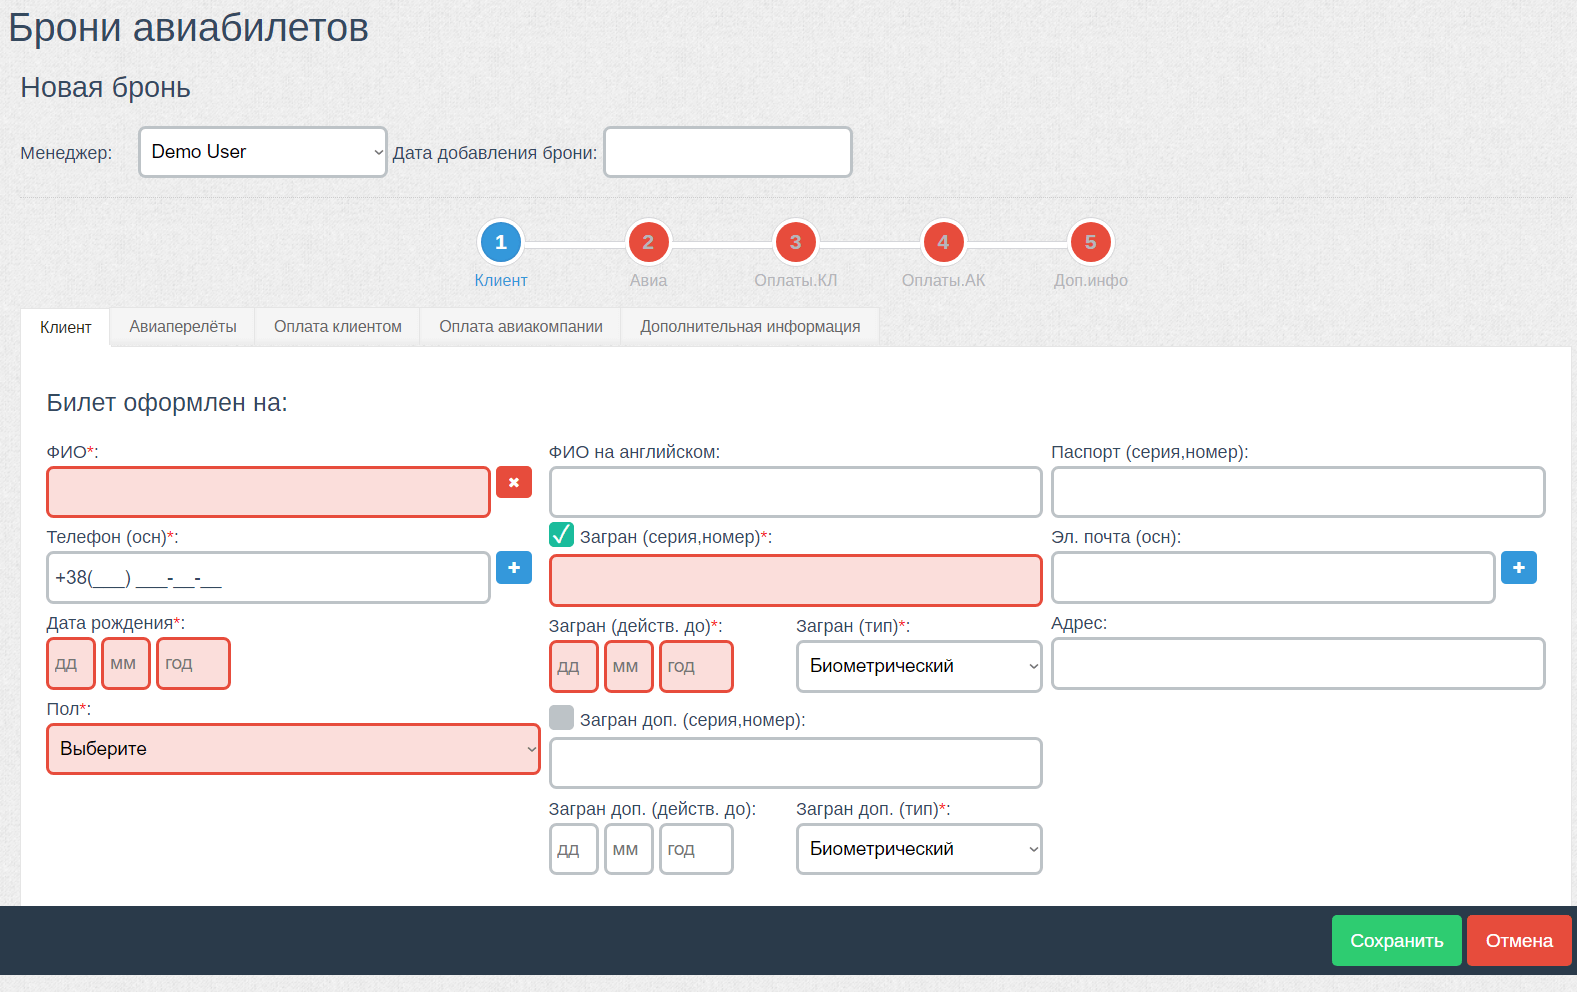 Crm система для авиабилетов компоненты битрикс слайдер